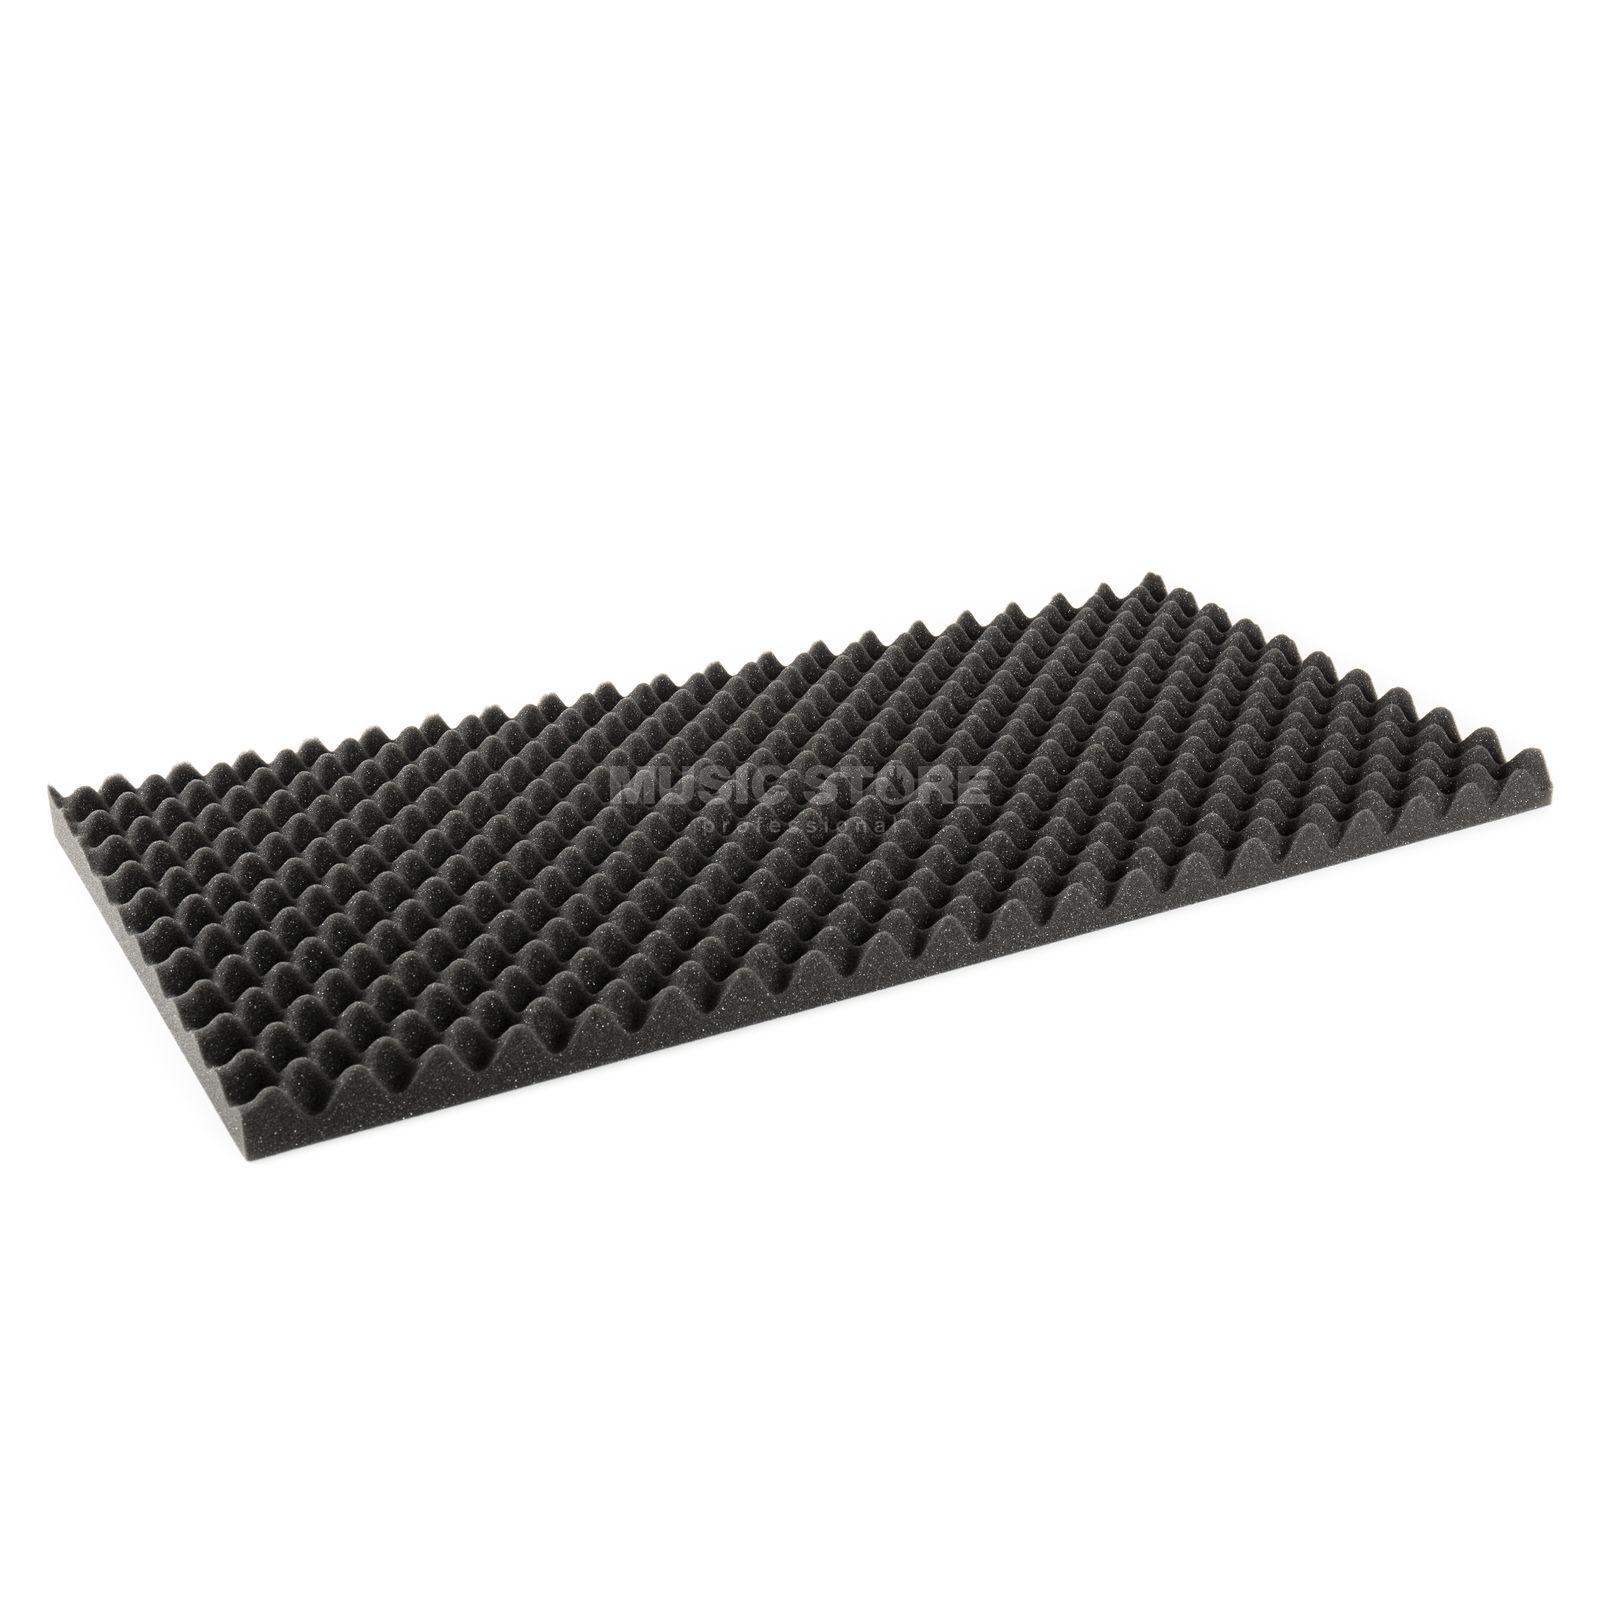 music store noppenschaum anthrazit 40 50 x 100 cm 40 mm stark. Black Bedroom Furniture Sets. Home Design Ideas